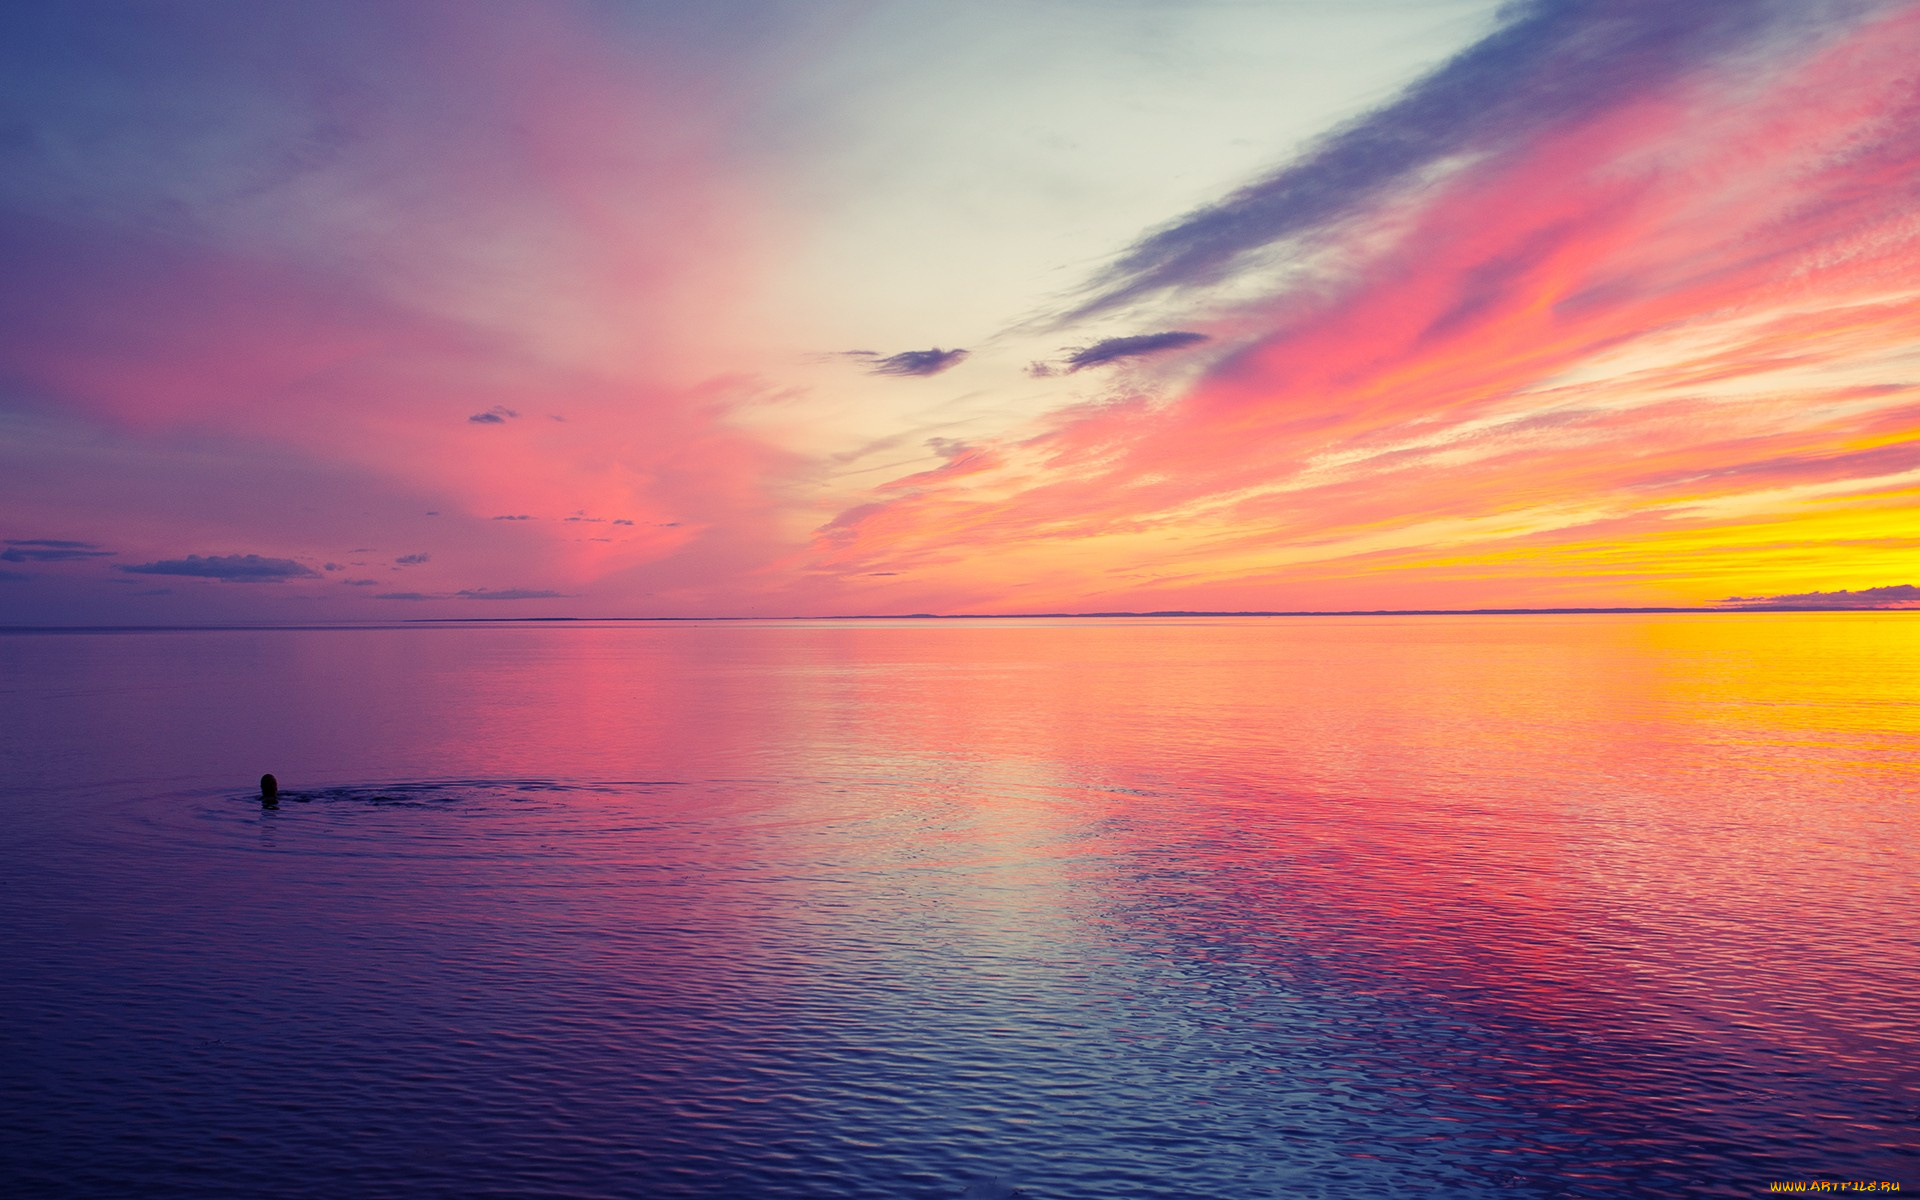 Картинка с рассветом на море, днем